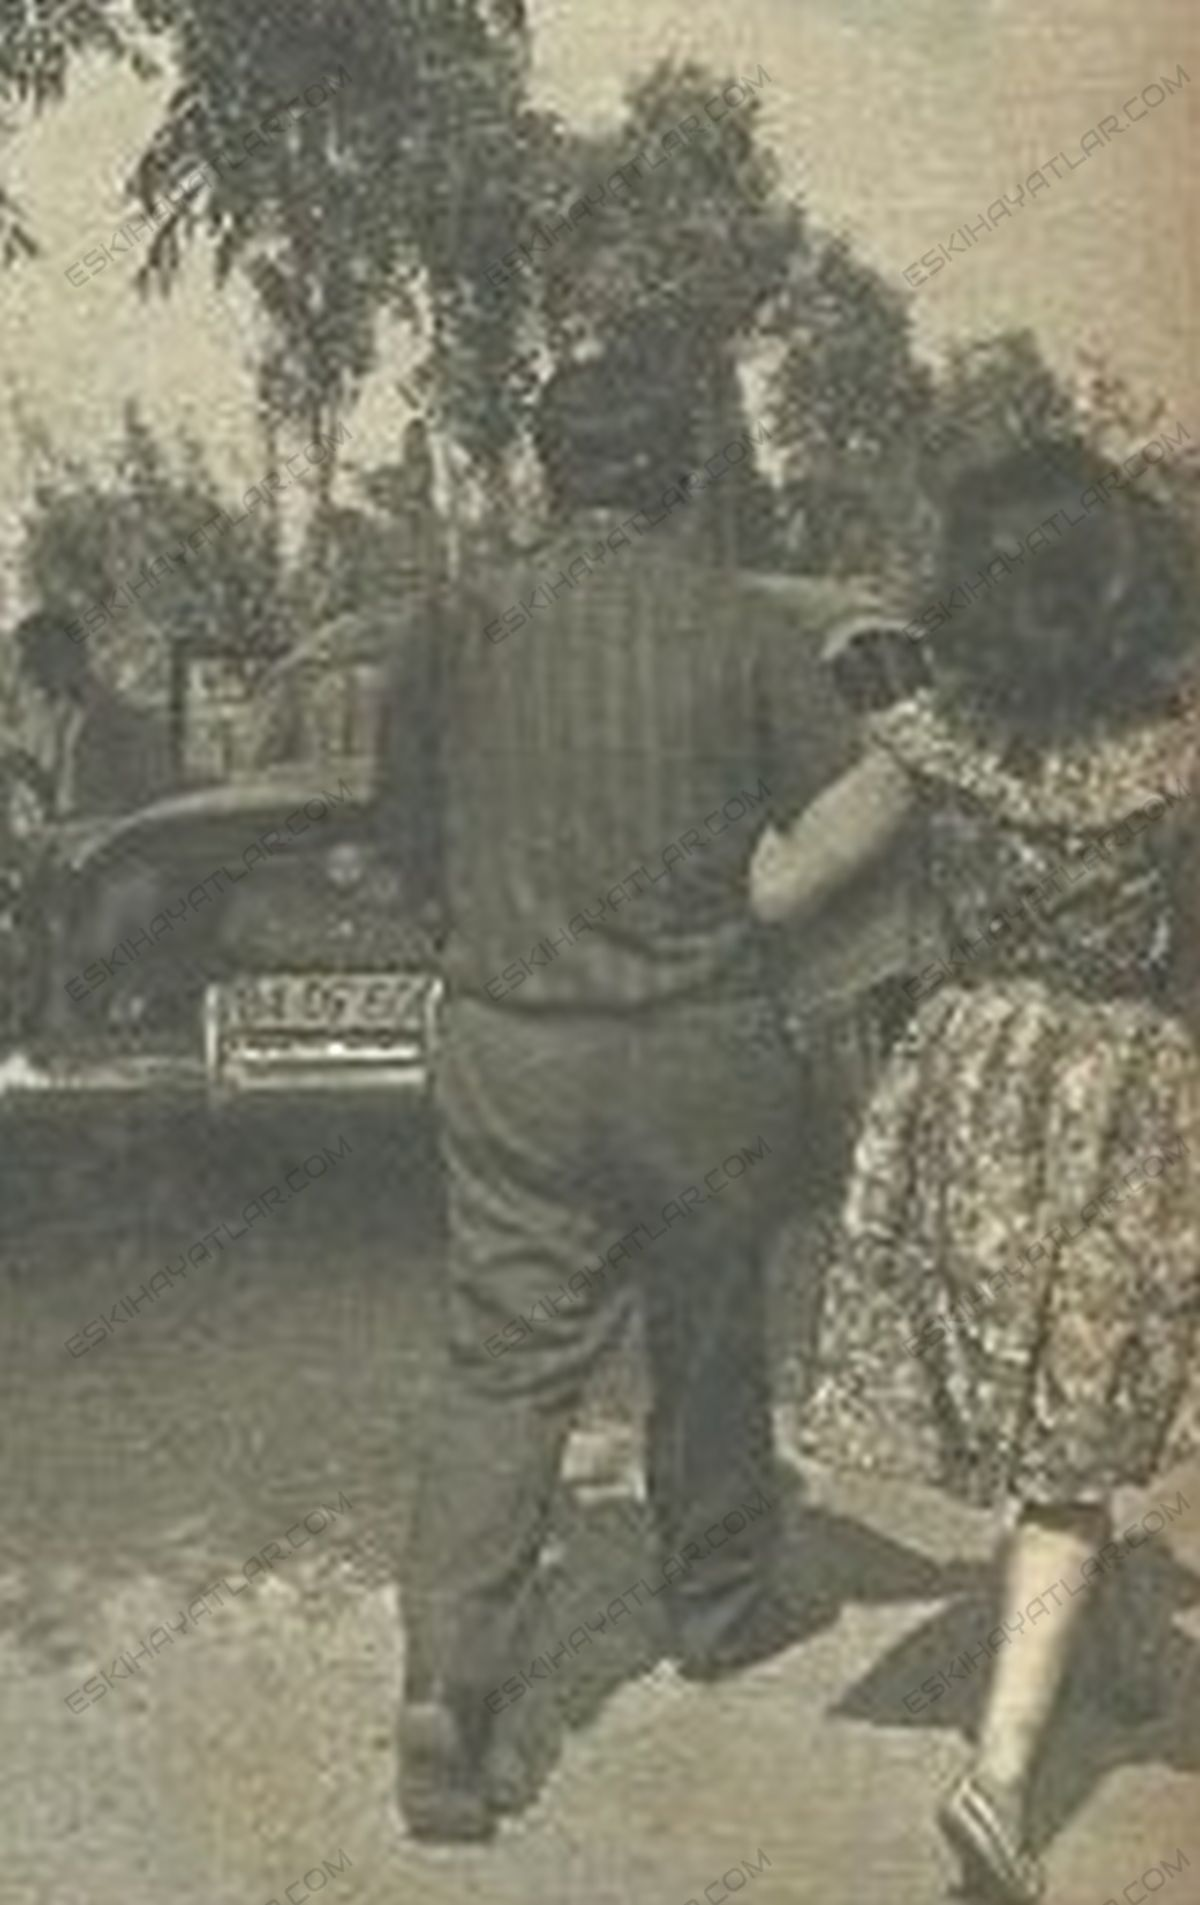 0371-semra-sar-kimdir-semra-sar-fotograflari-1964-ses-dergisi-arsivleri (5) (1)